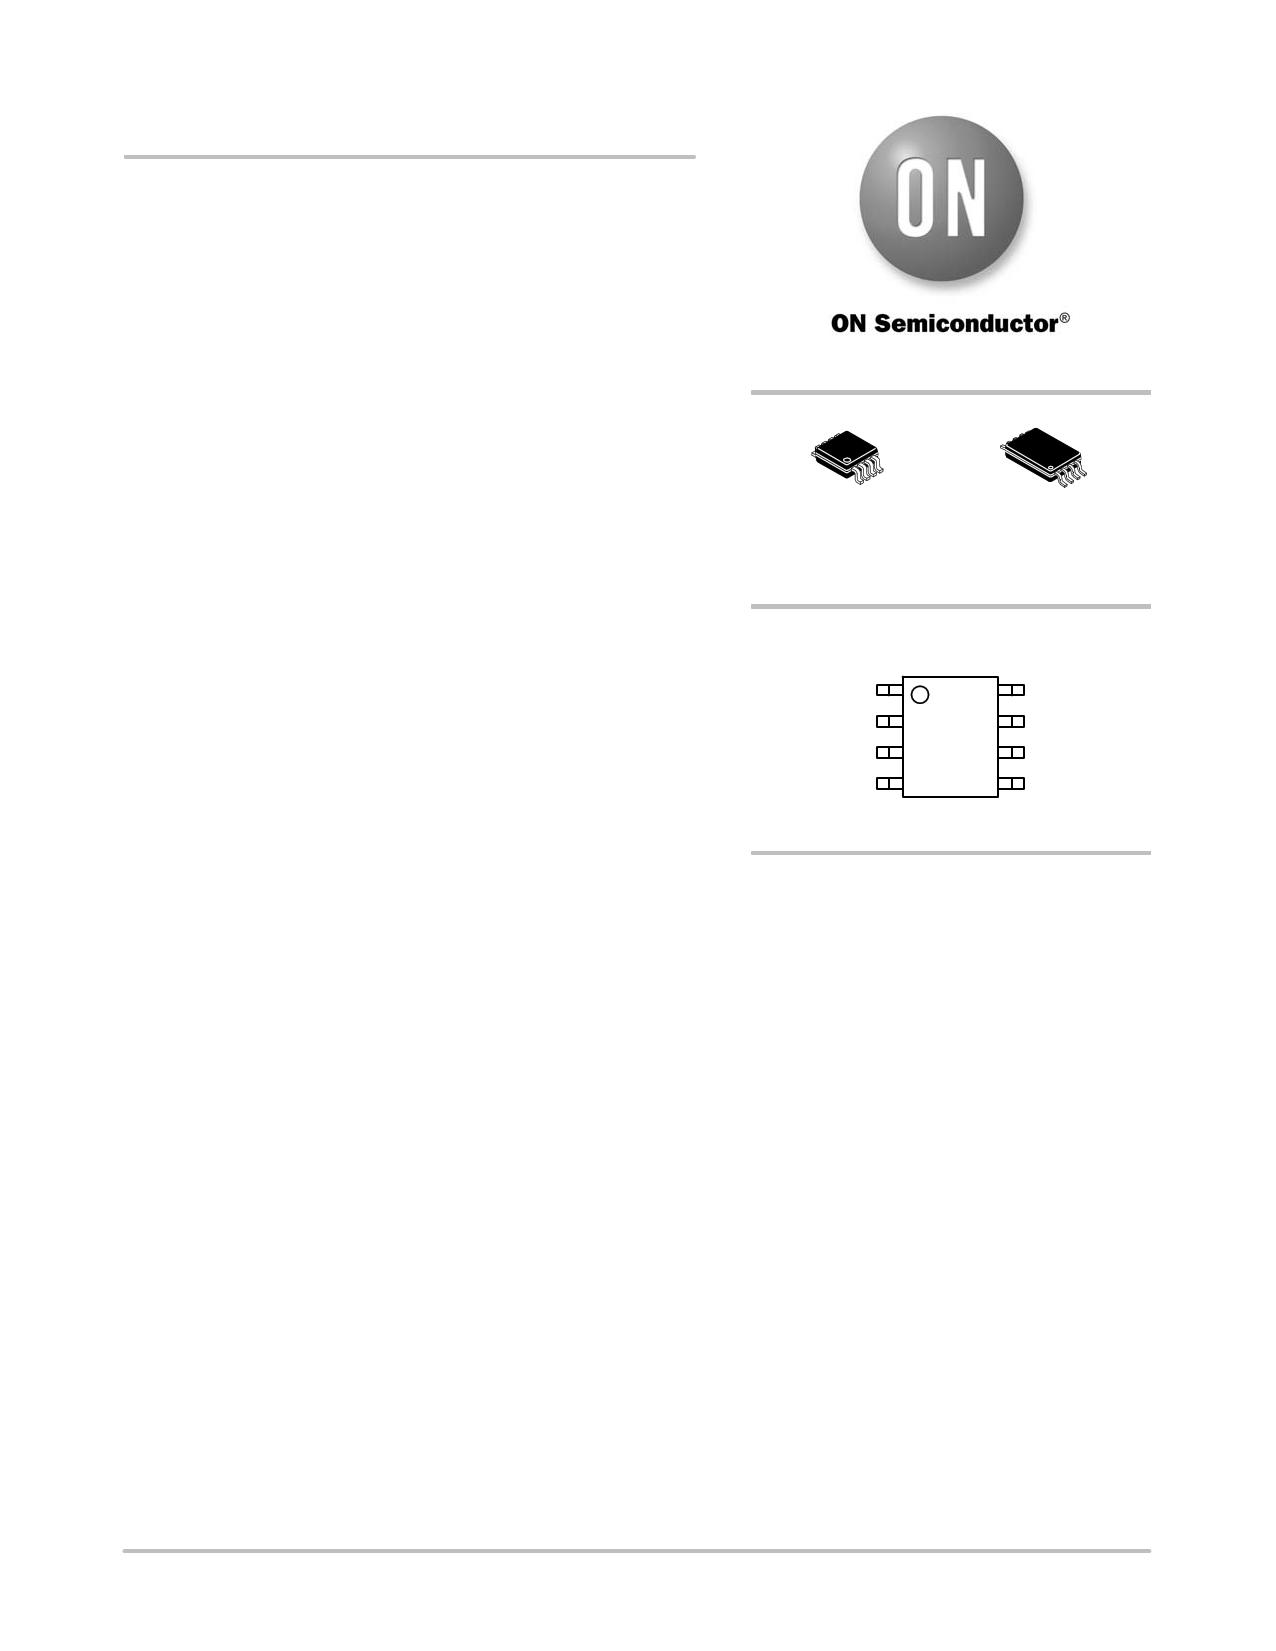 ASM3P2107A Datasheet, ASM3P2107A PDF,ピン配置, 機能